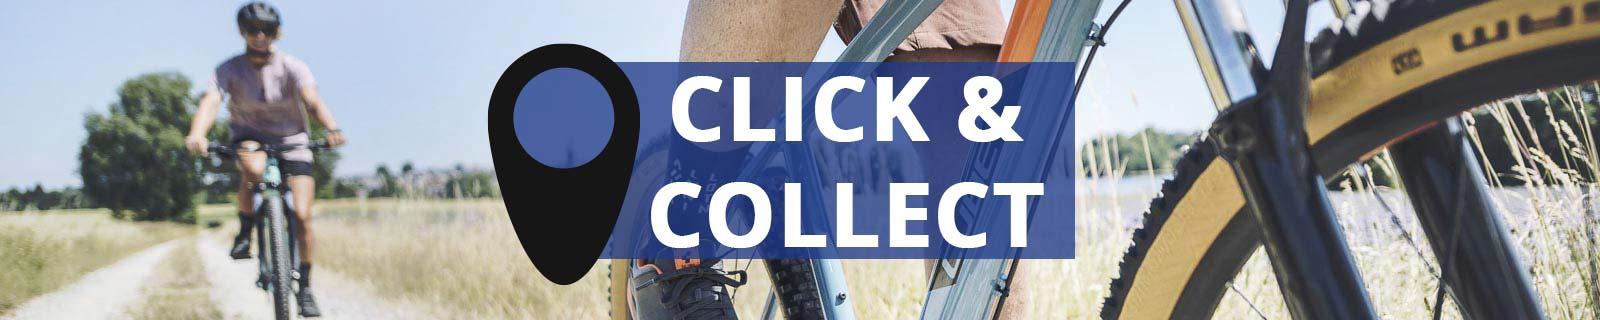 kategoriebild-click-collect_pin